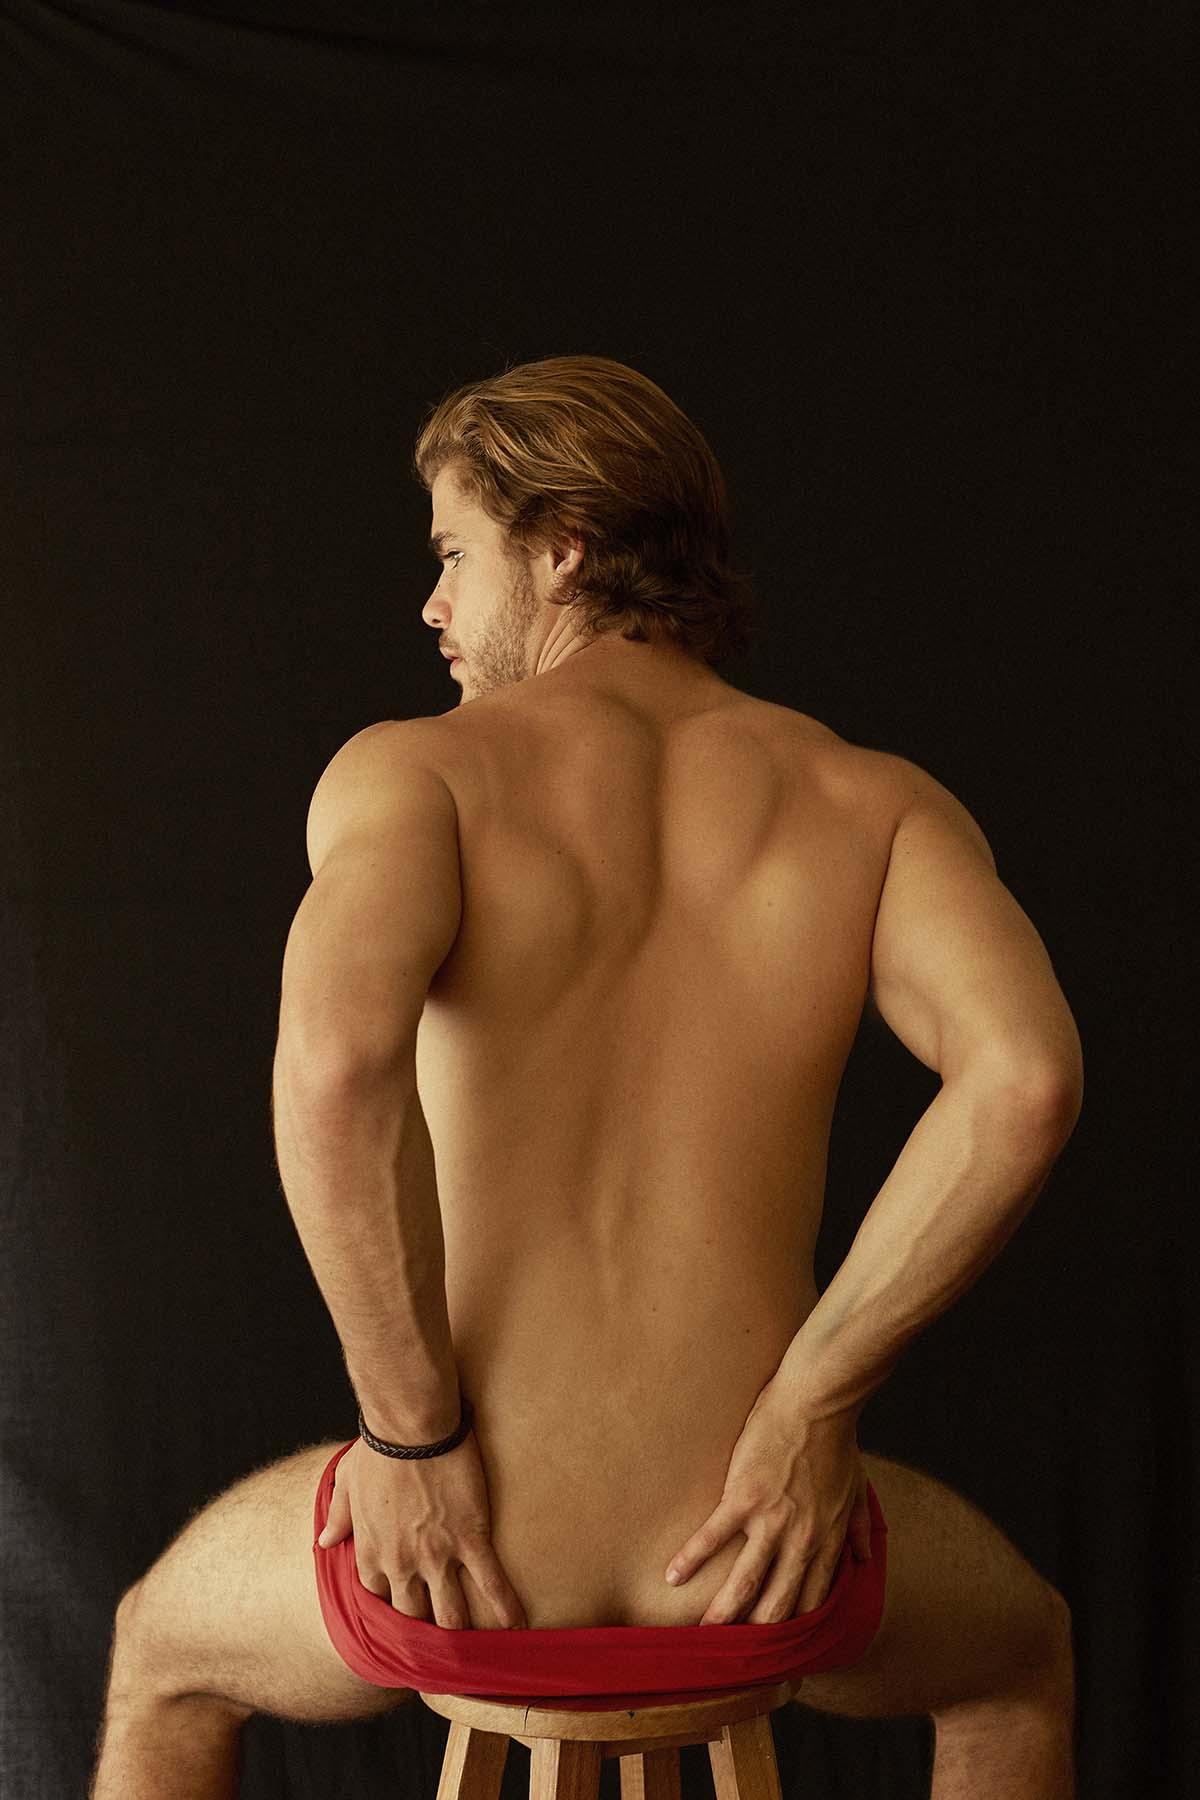 Johan Bruinsma by Vicente Mosto for Brazilian Male Model